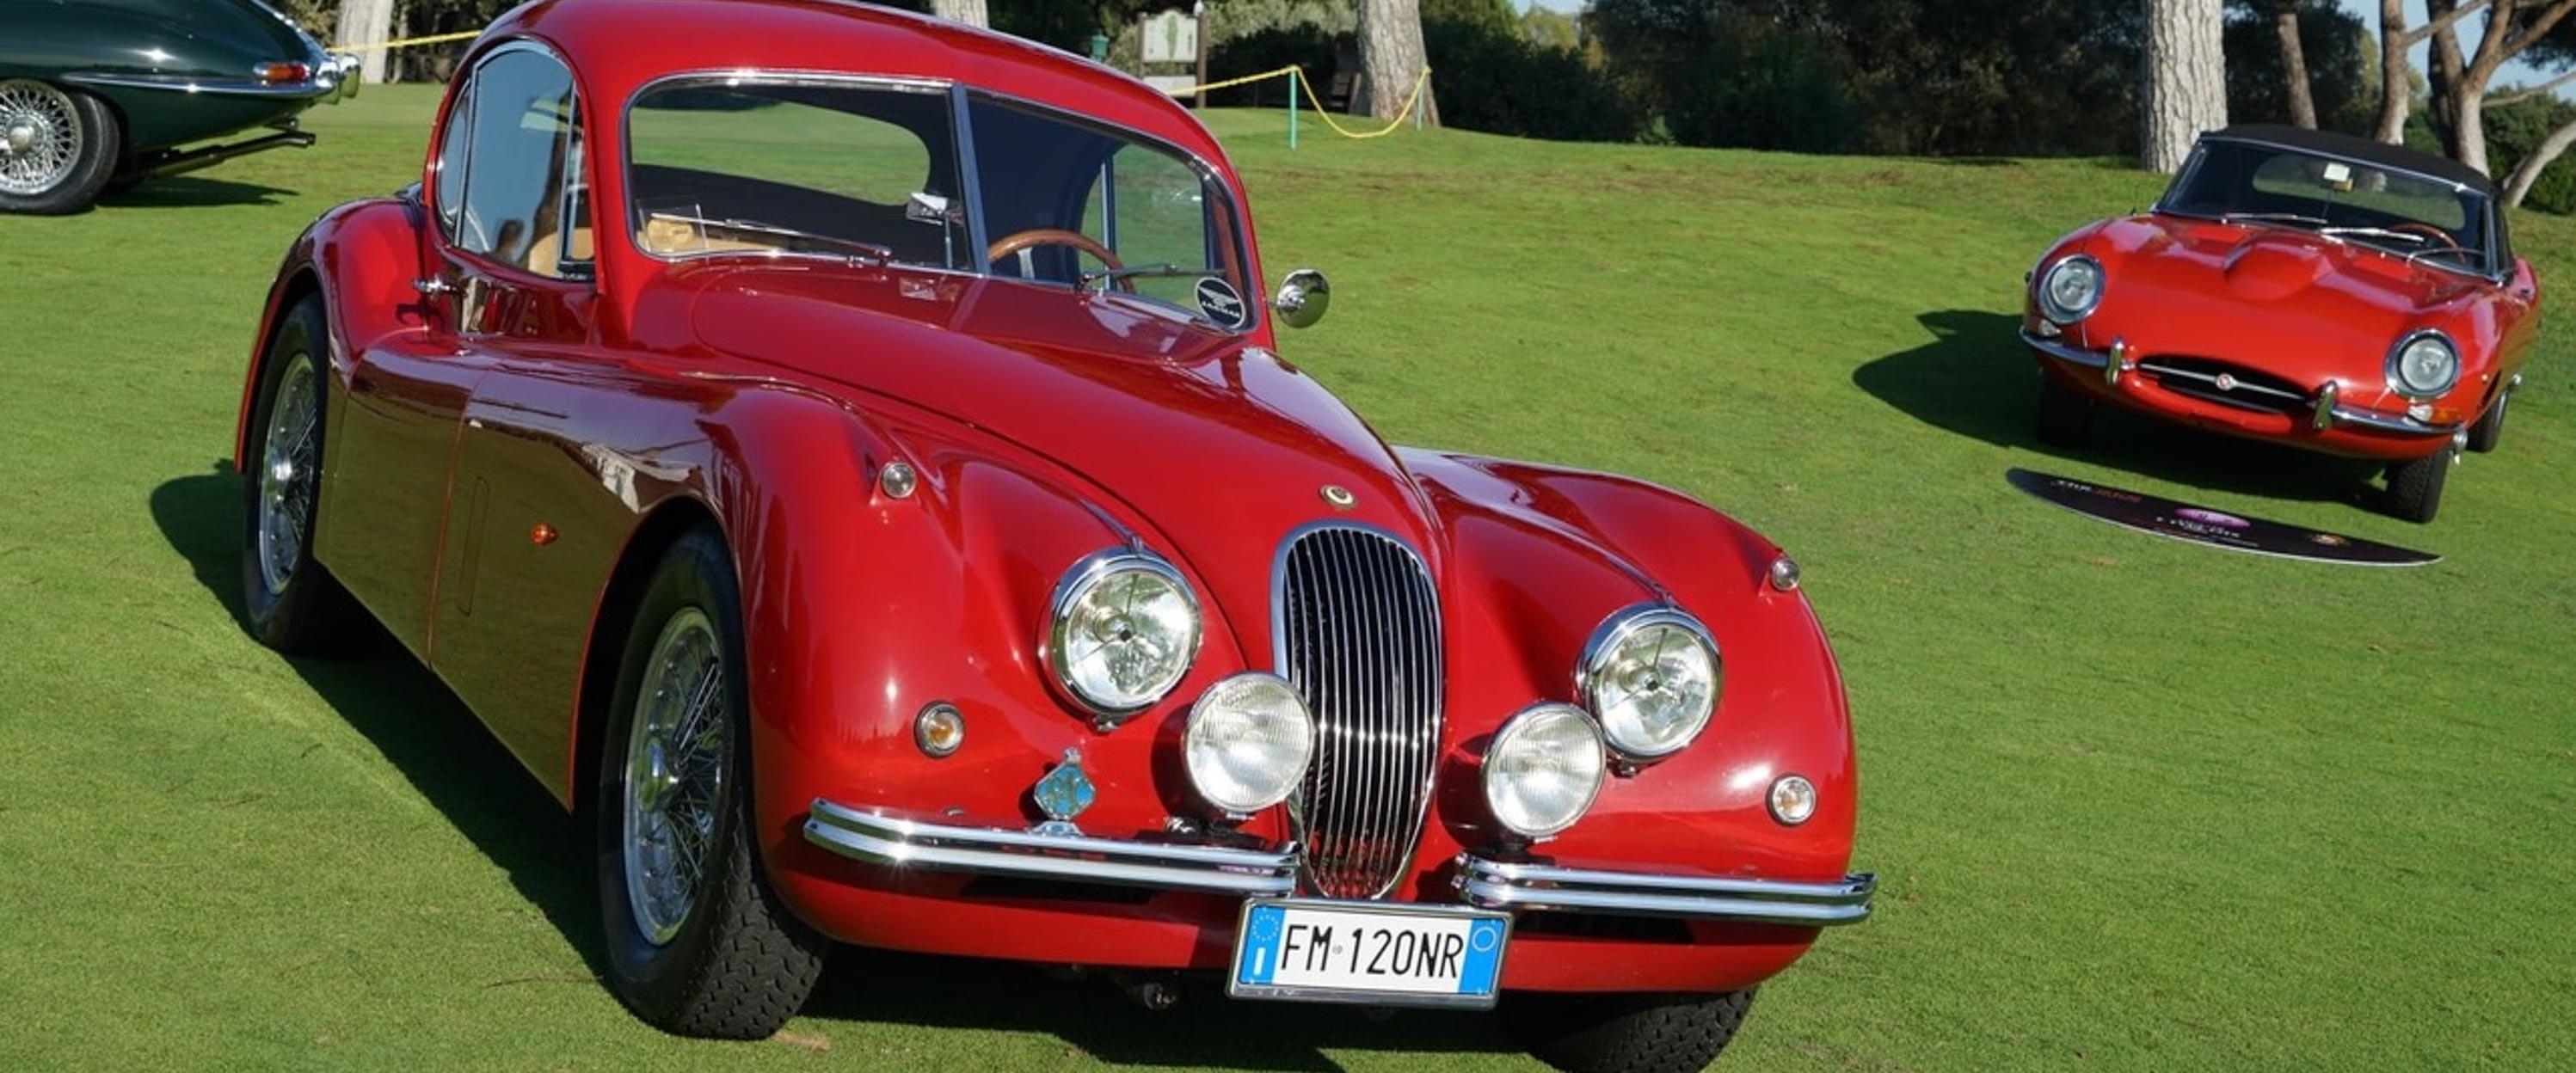 1954-Jaguar-XK120-Red-slideshow-025@2x